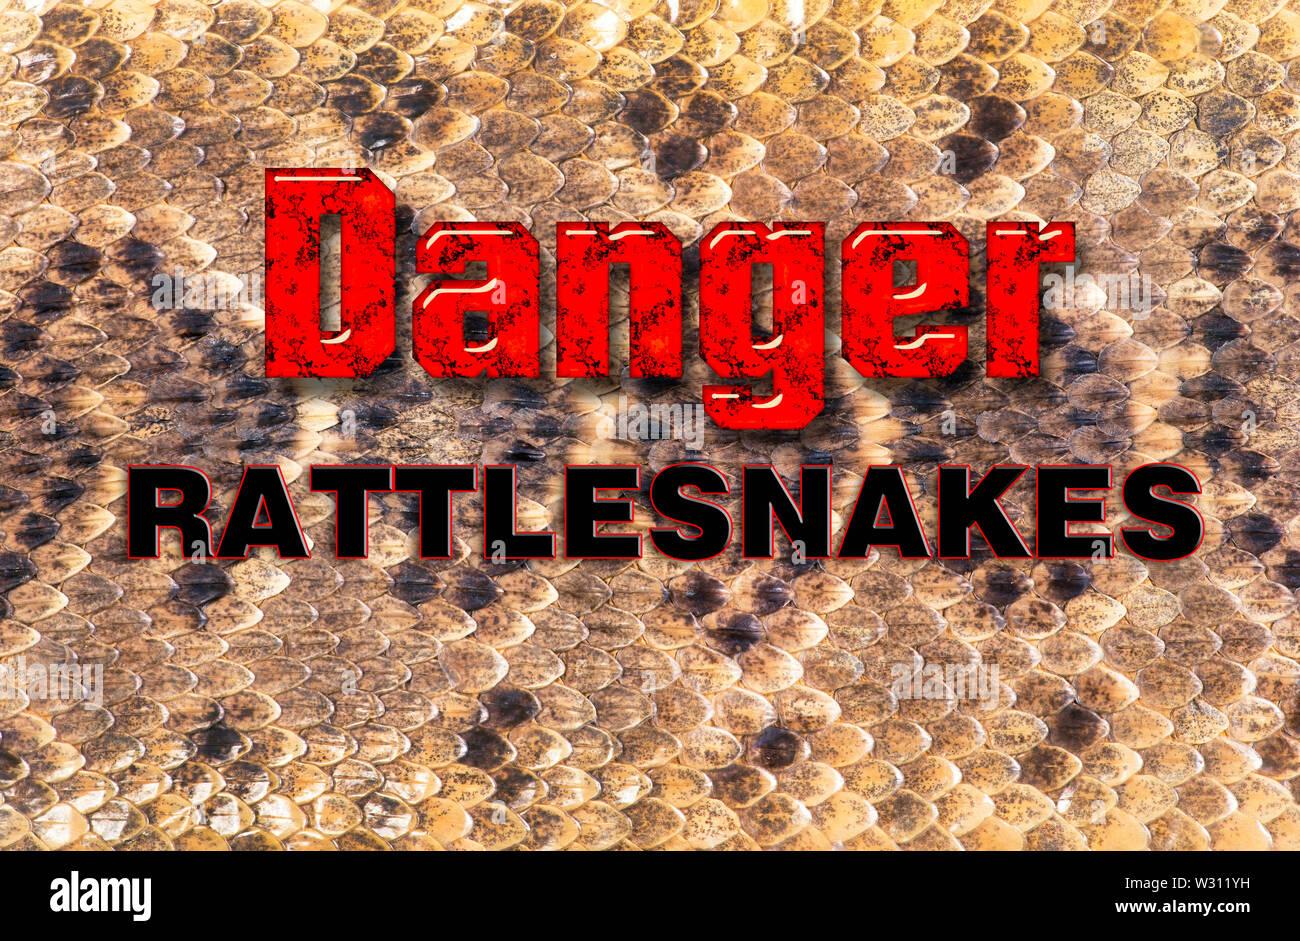 Texas diamondback rattlesnake skin will make for great background. - Stock Image